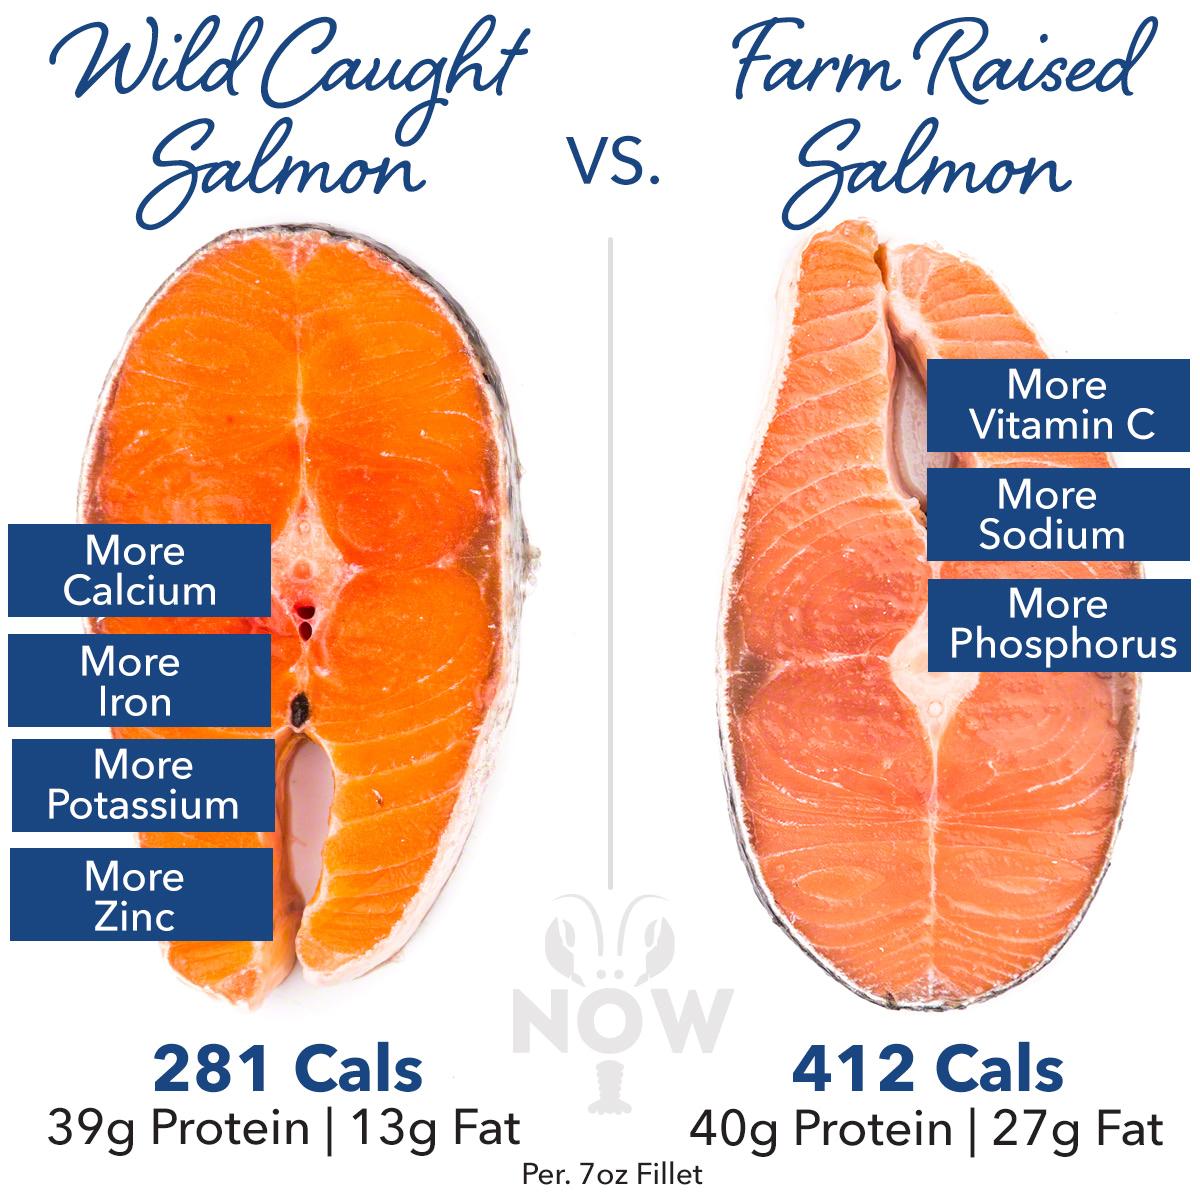 Wild caught vs farm raised salmon